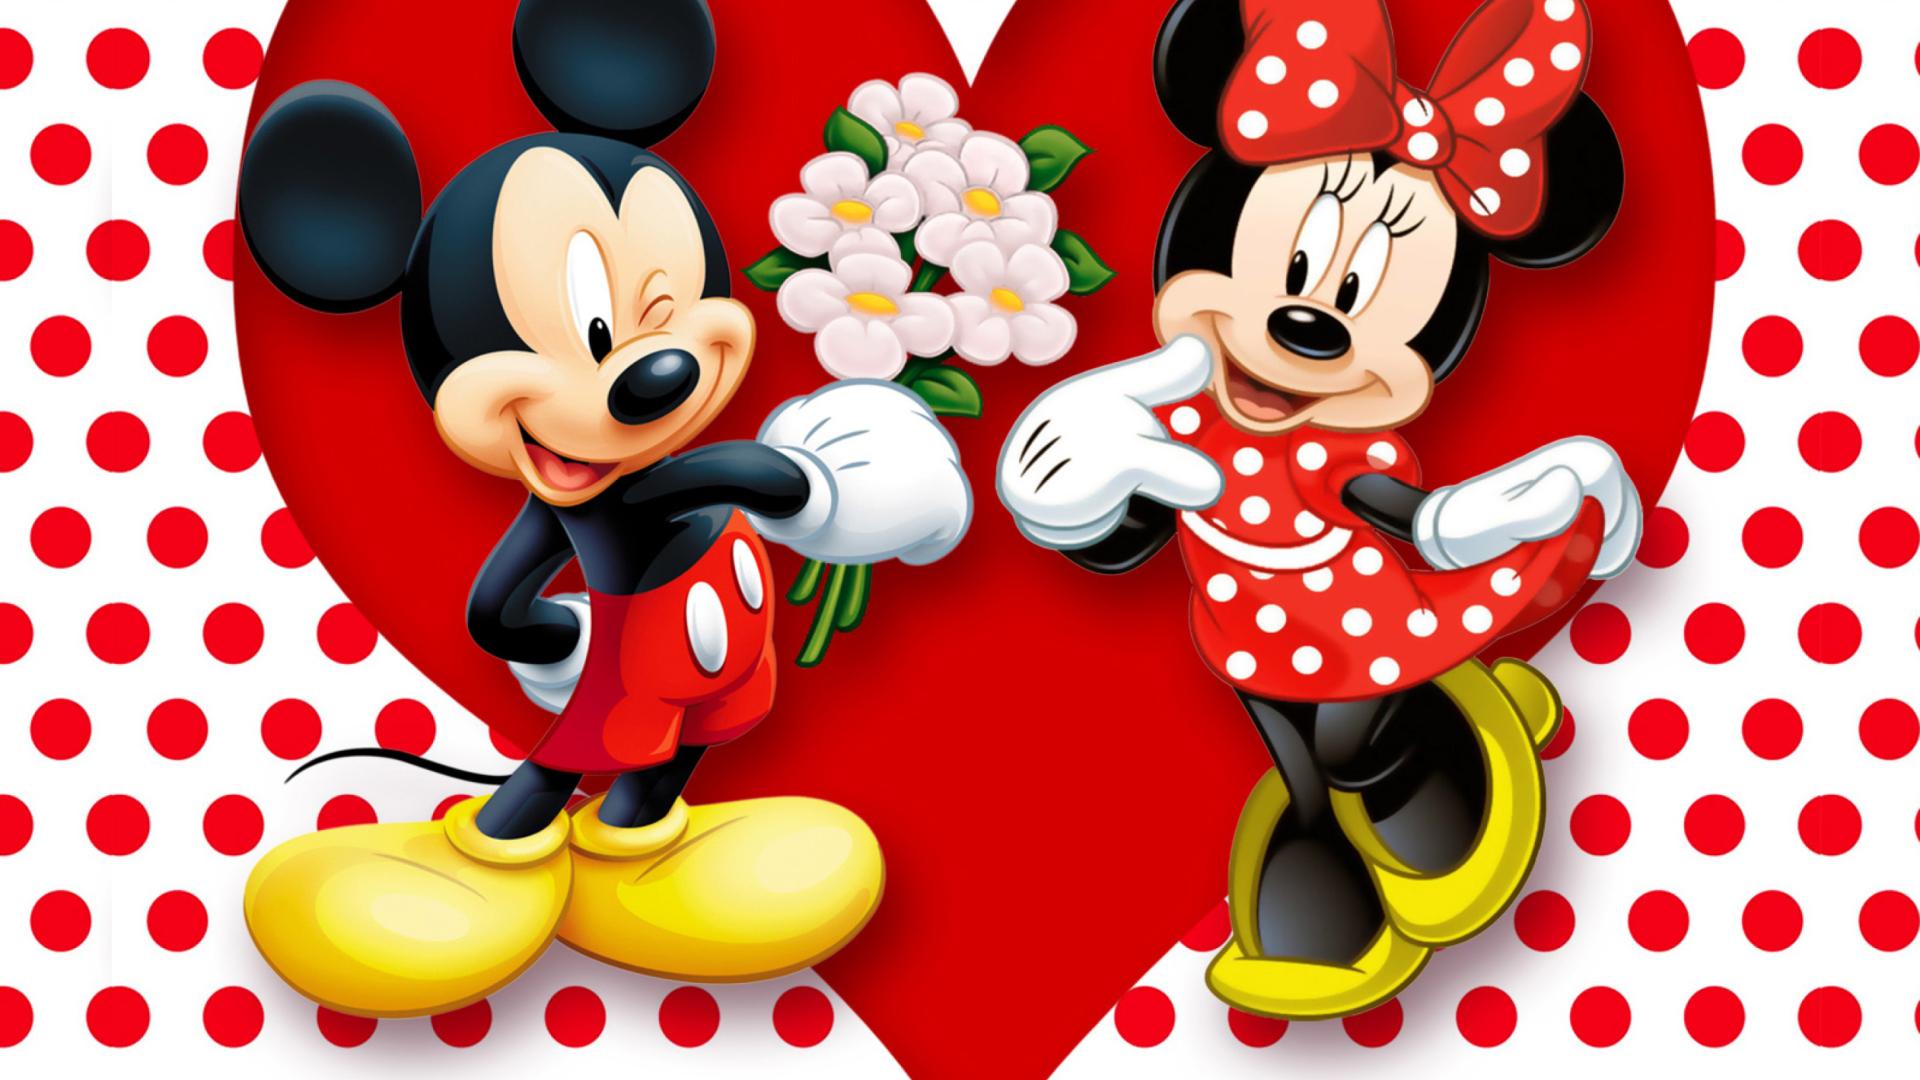 Minnie Mouse Wallpapers Hd Pixelstalknet